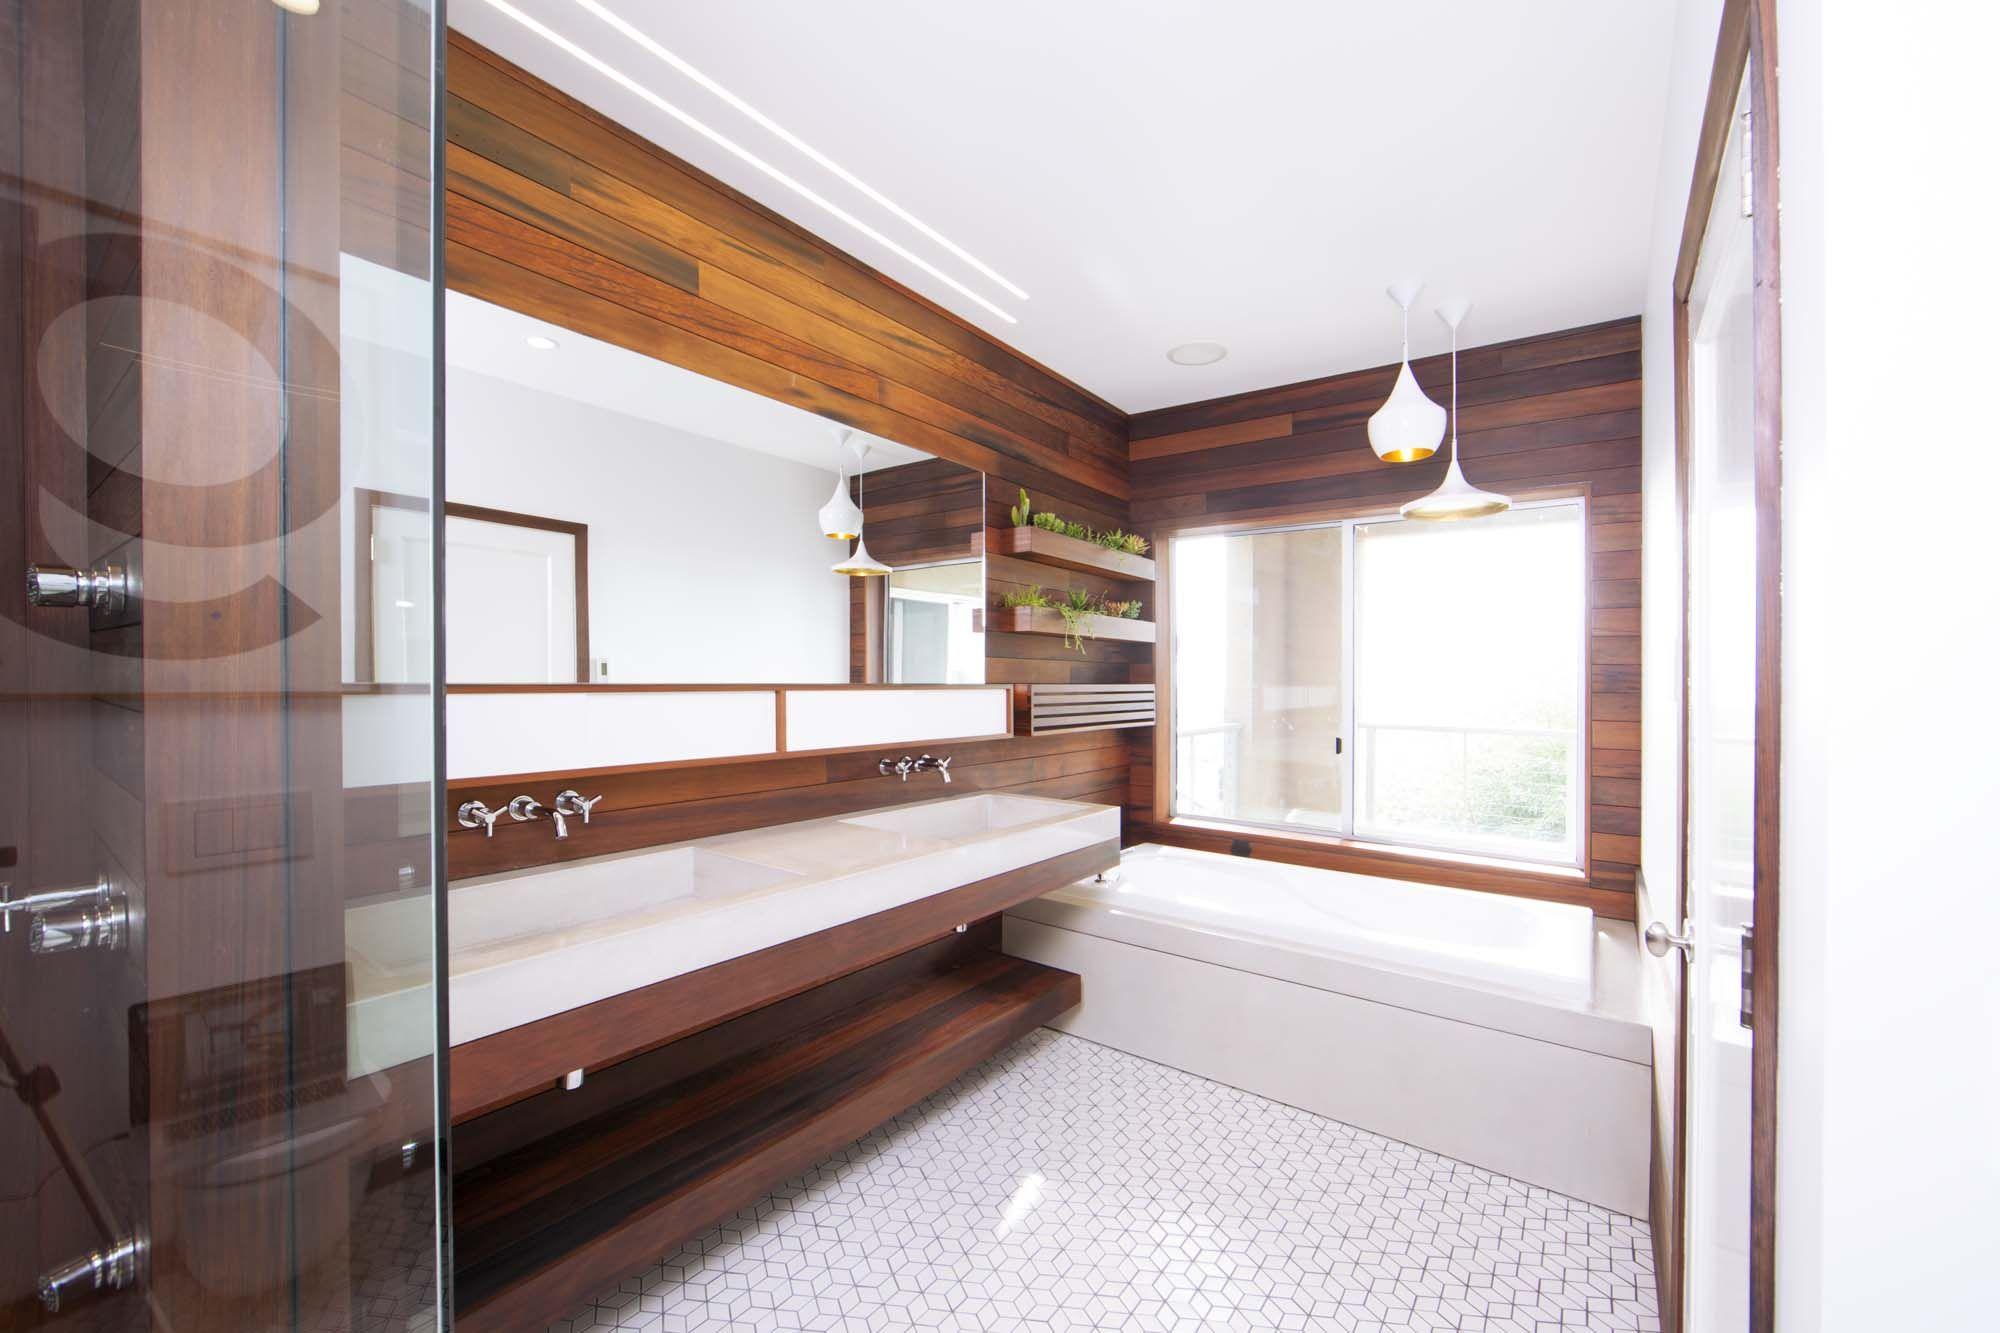 Modern Woodlined Bathroom Renovation With White Tile  Design Pleasing San Francisco Bathroom Remodel Decorating Inspiration